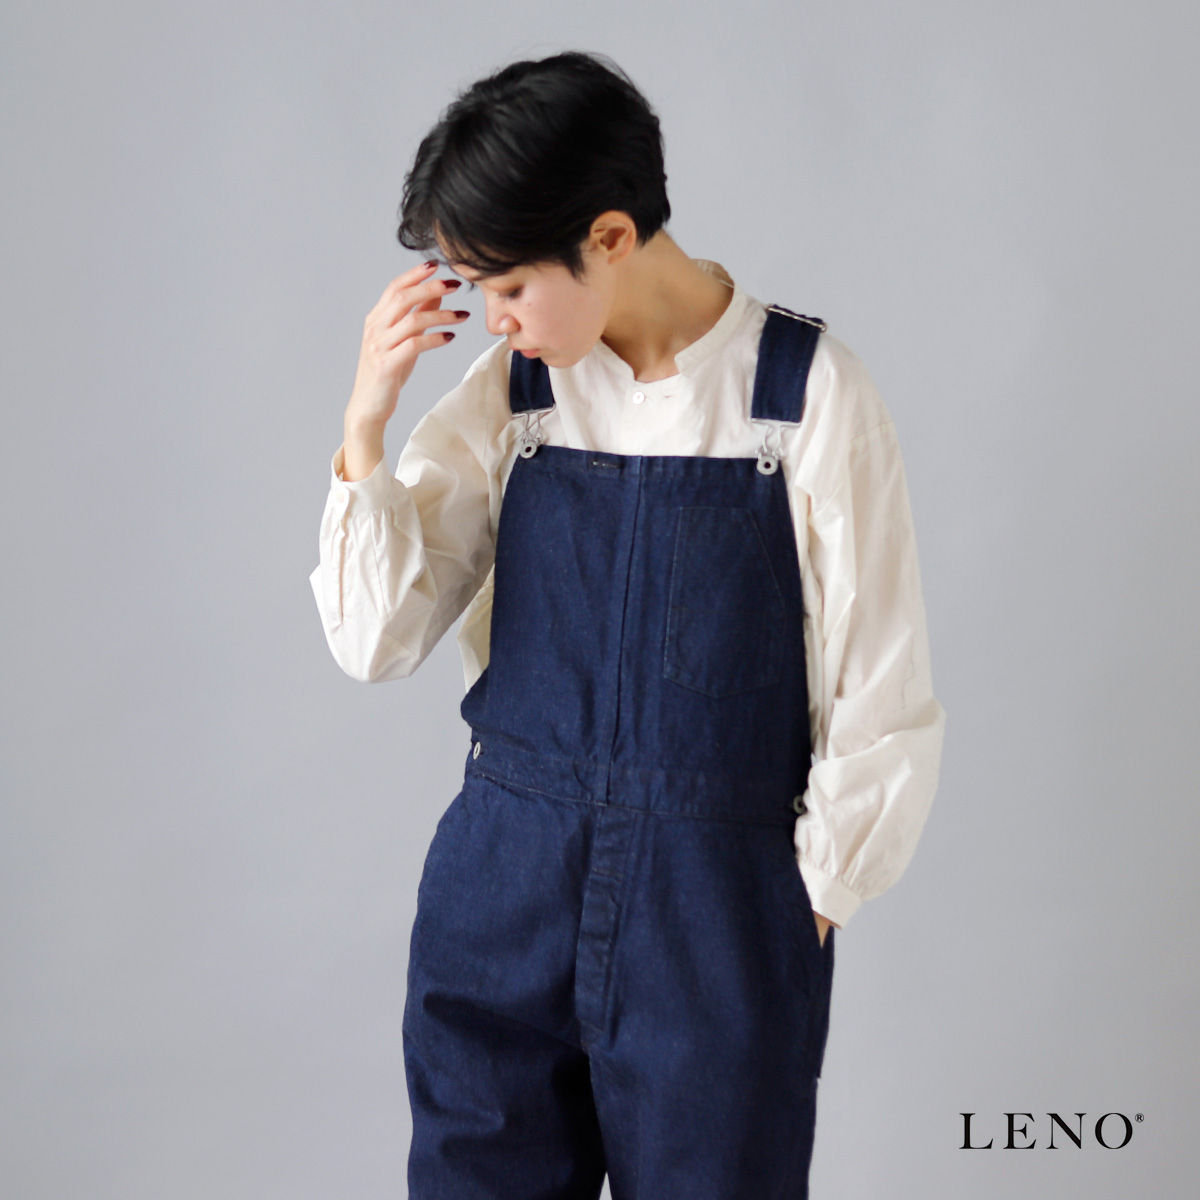 LENO(リノ)セルヴィッチデニムオーバーオール l2001-pt005